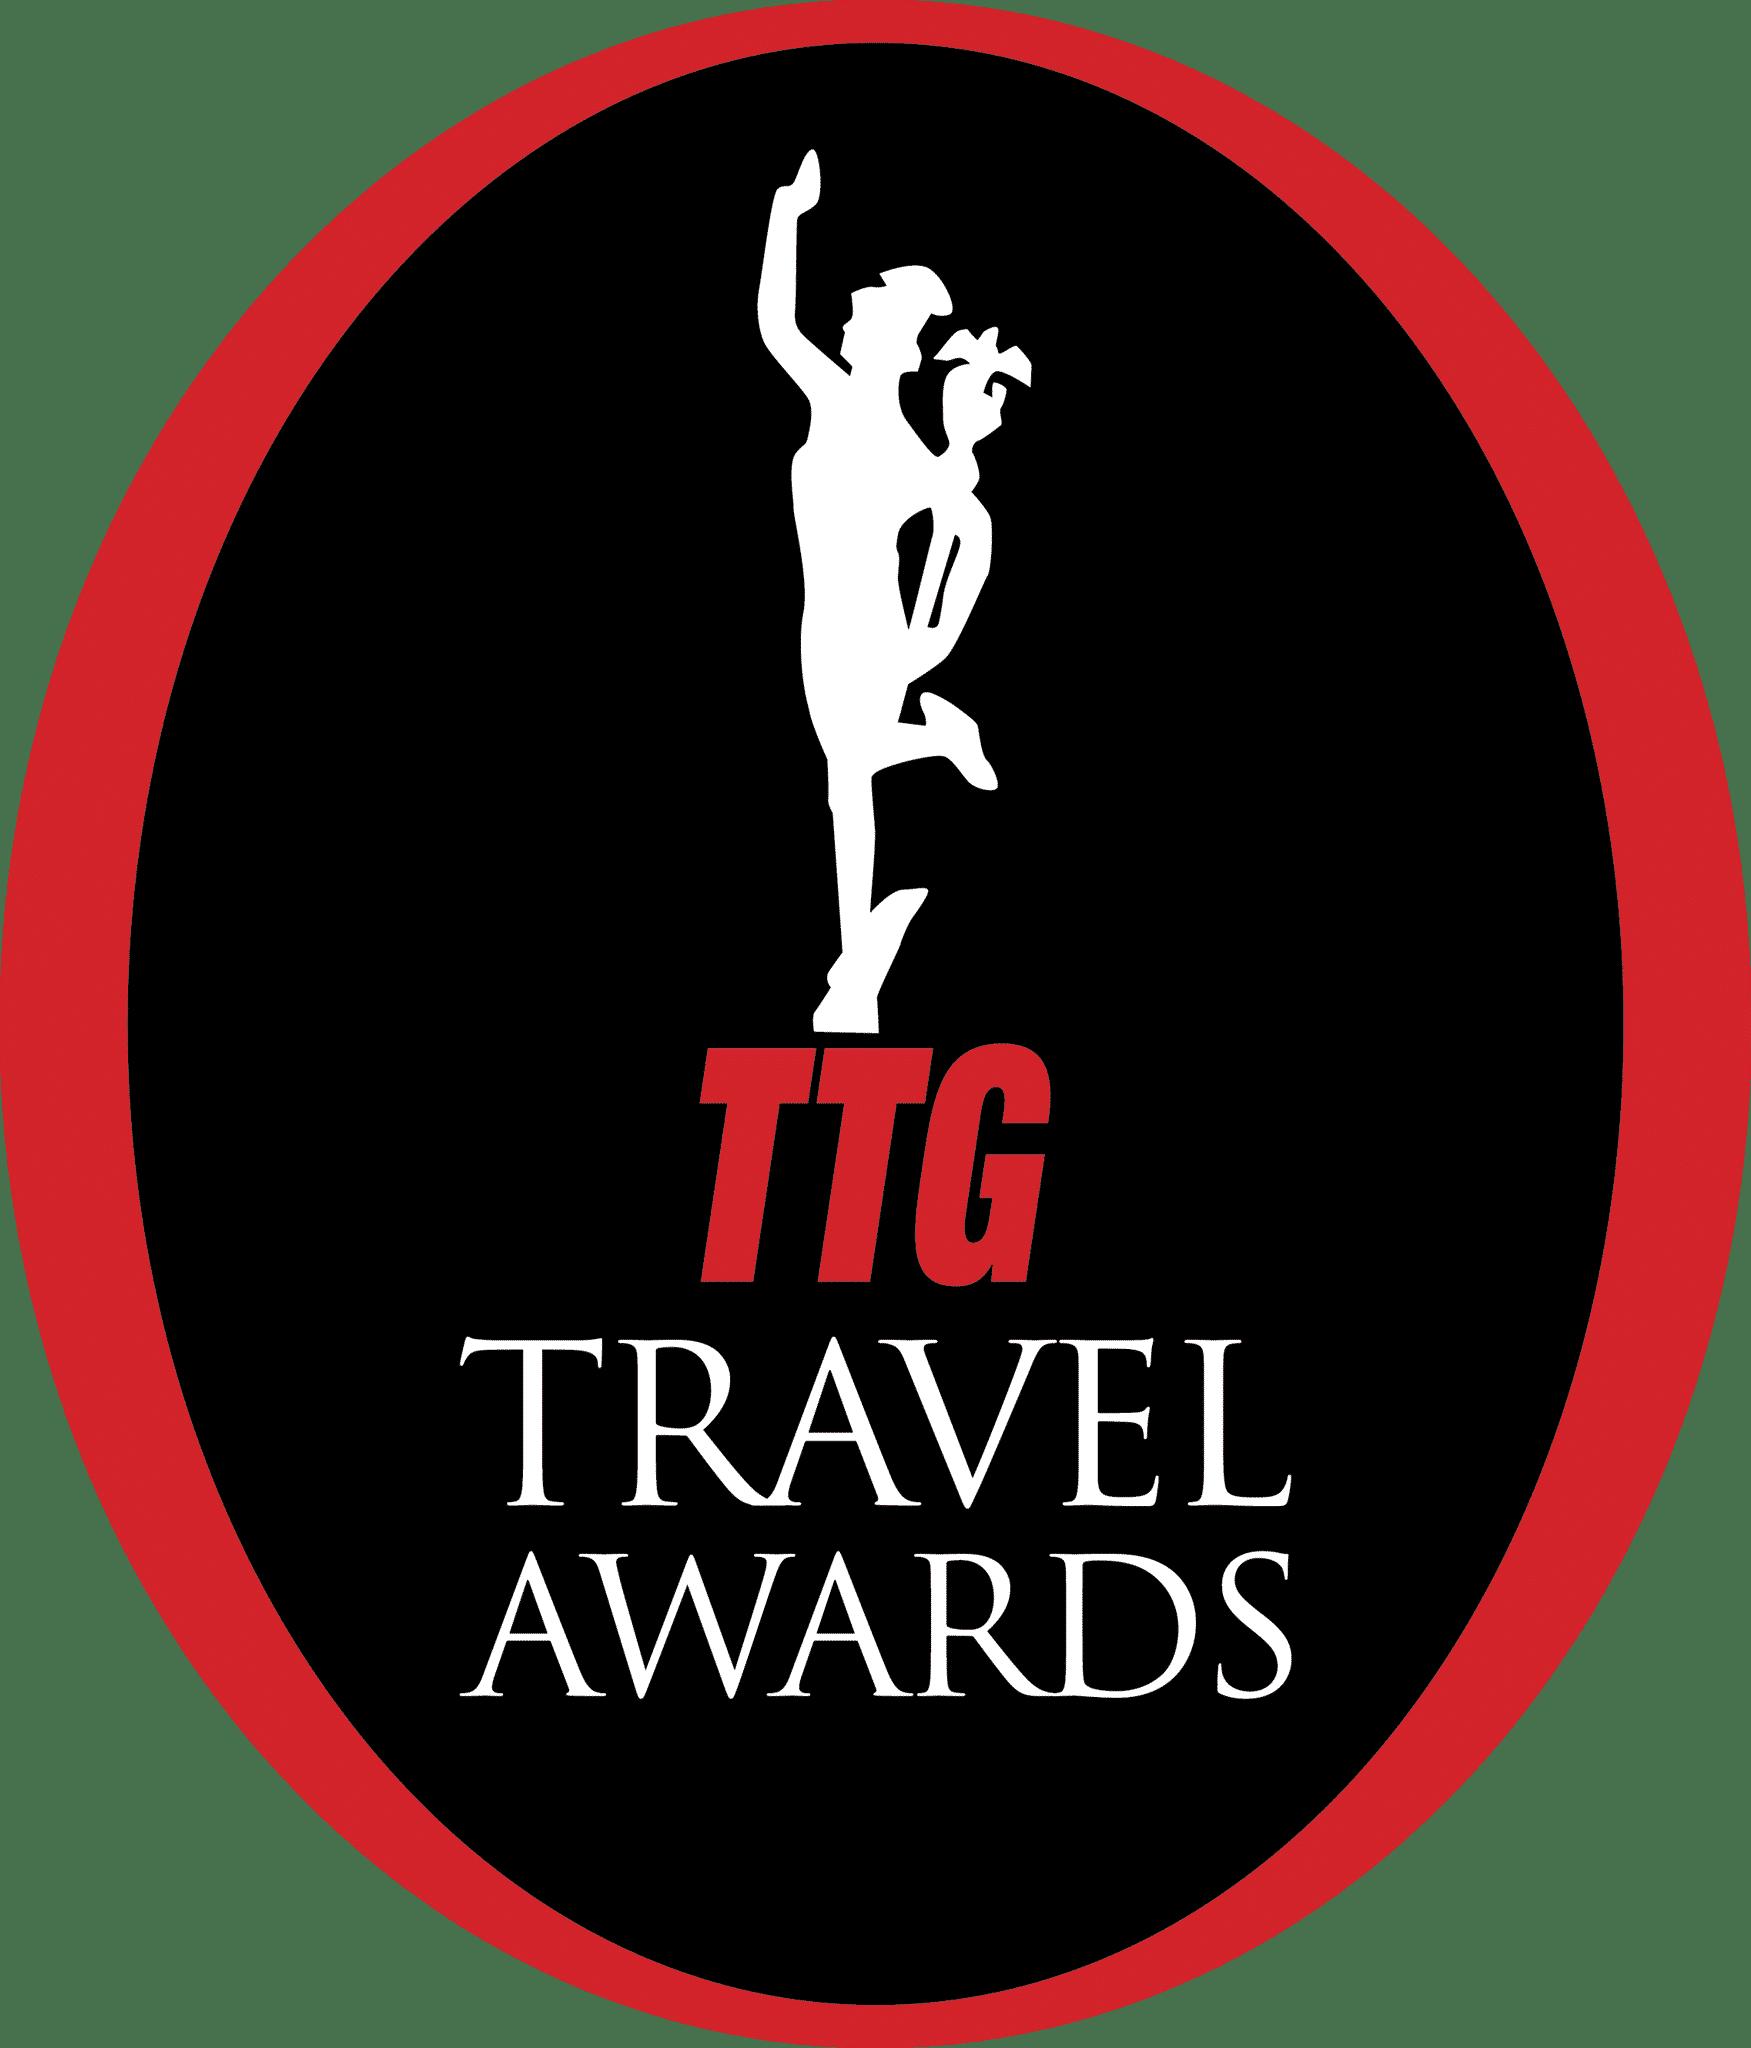 ttg-travel-award-logo